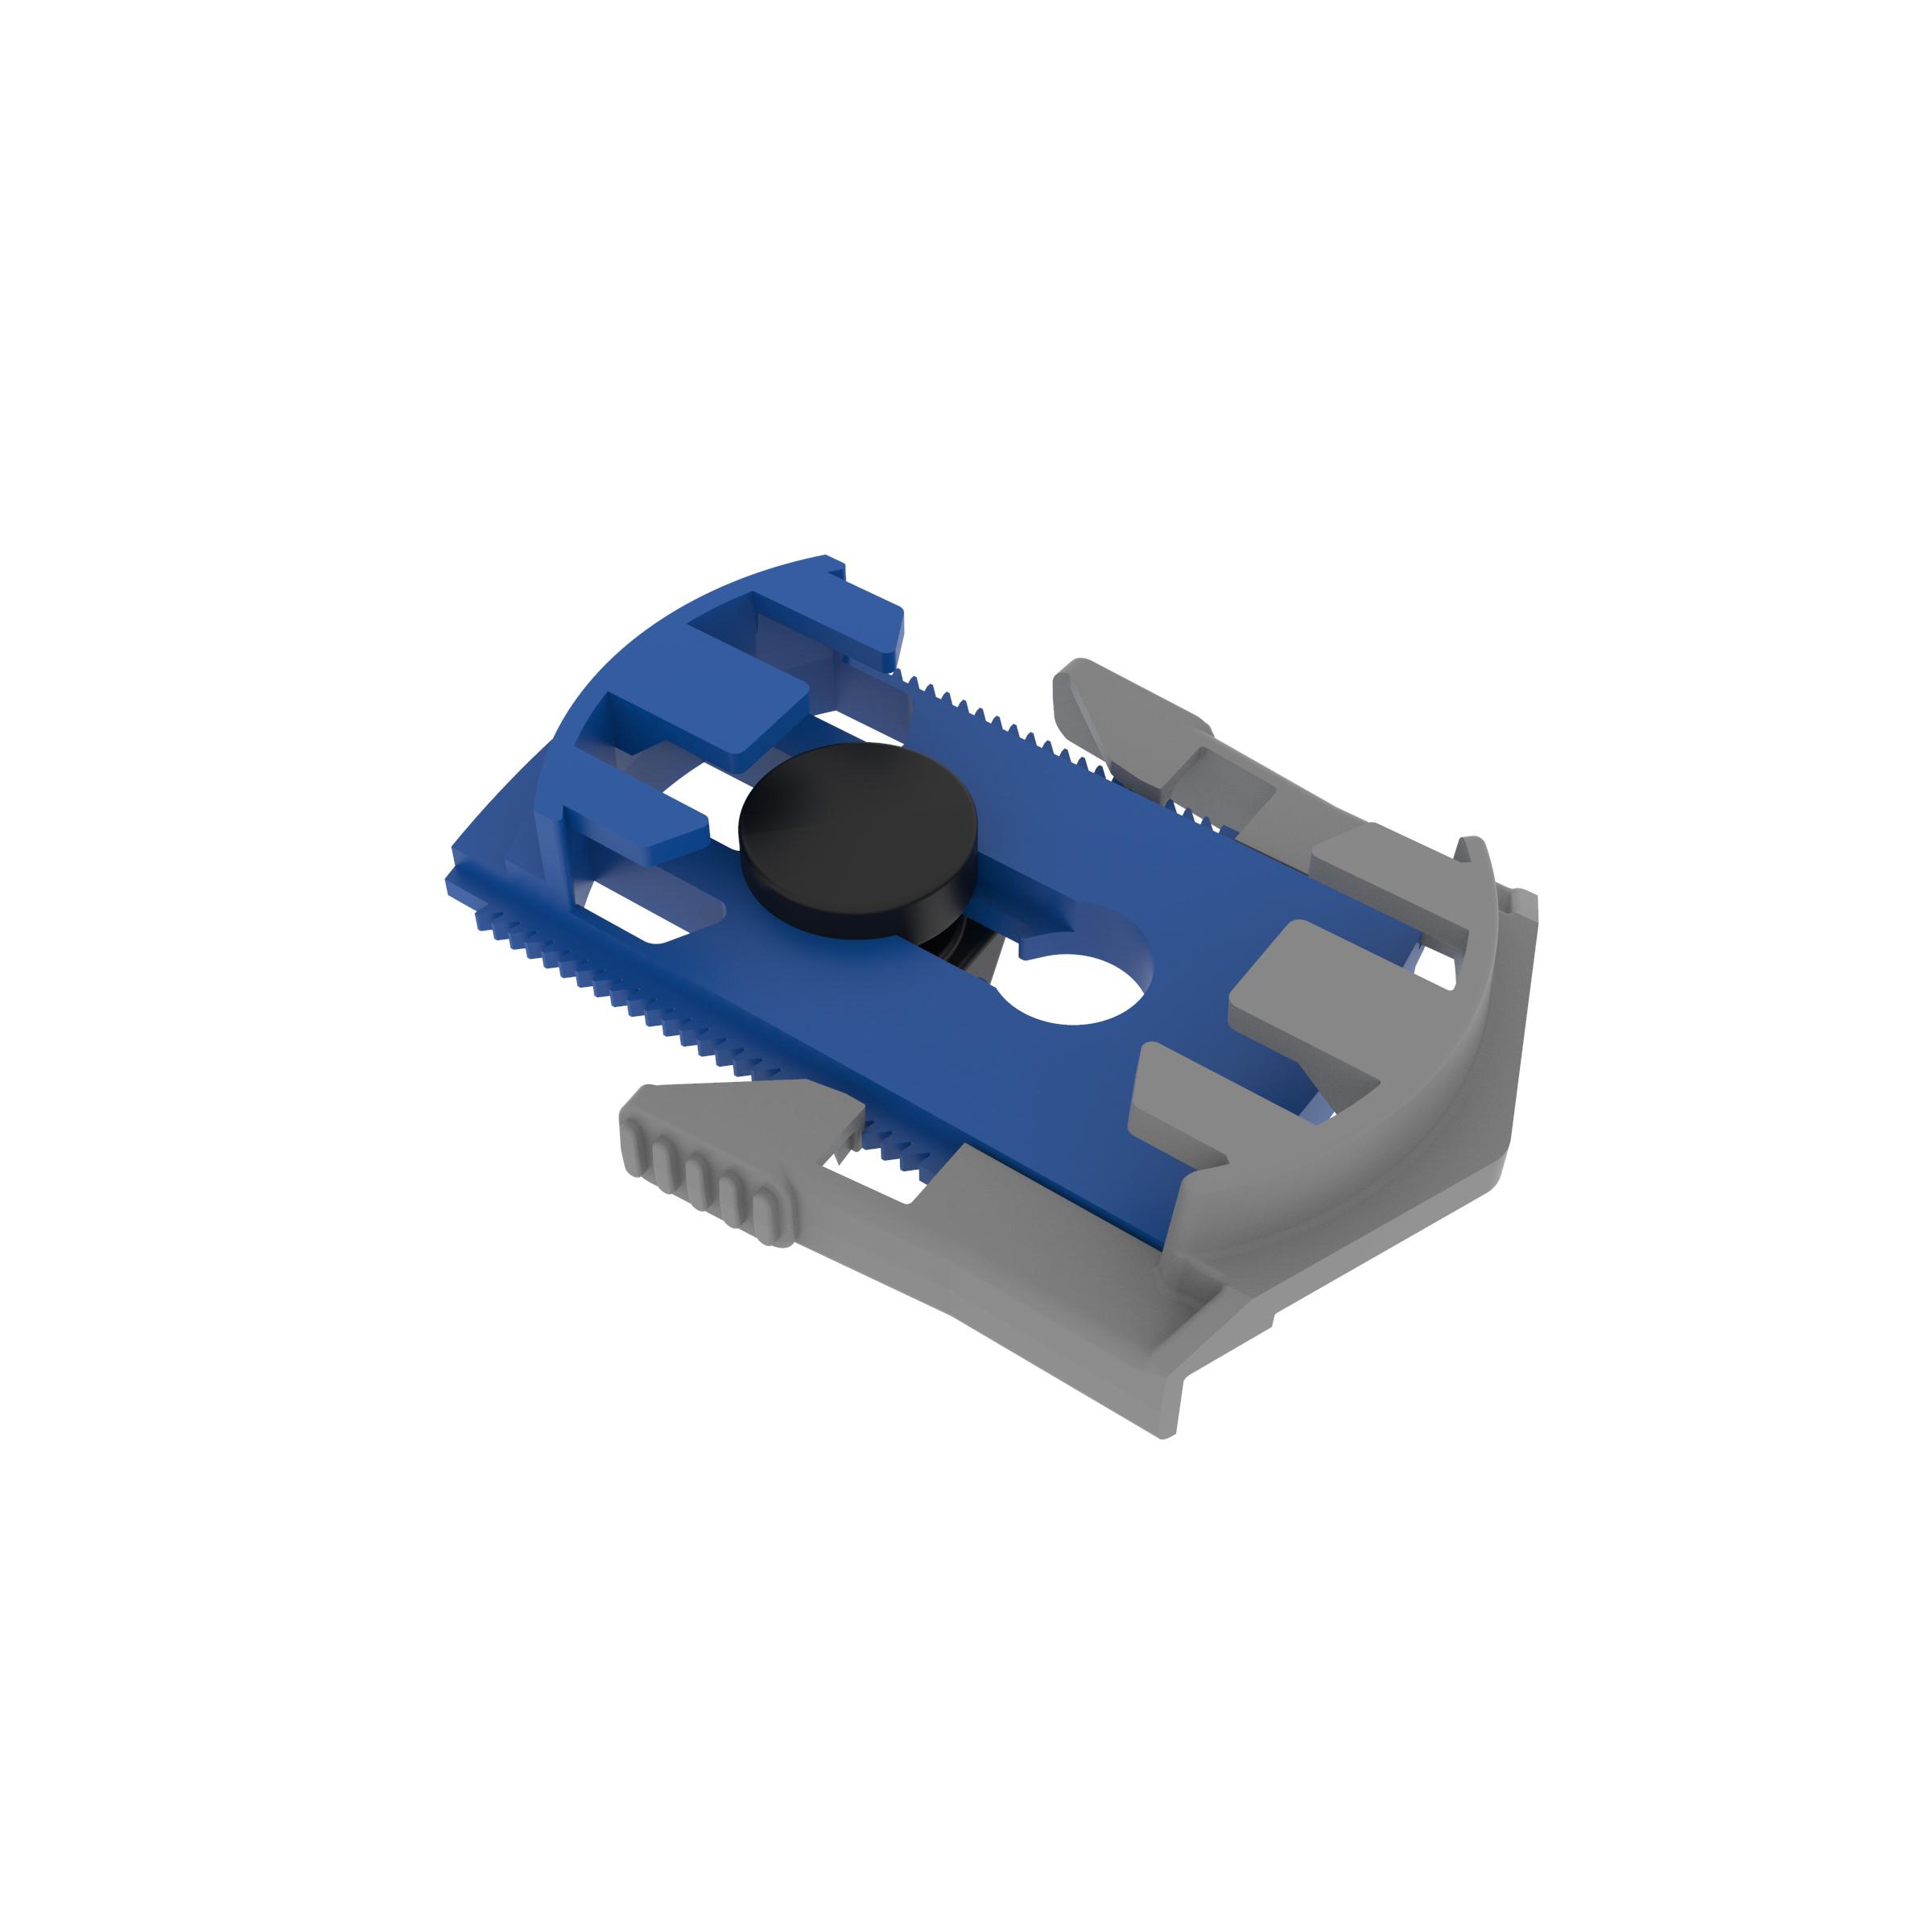 Kreg® Pocket-Hole Jig Universal Clamp Adapter